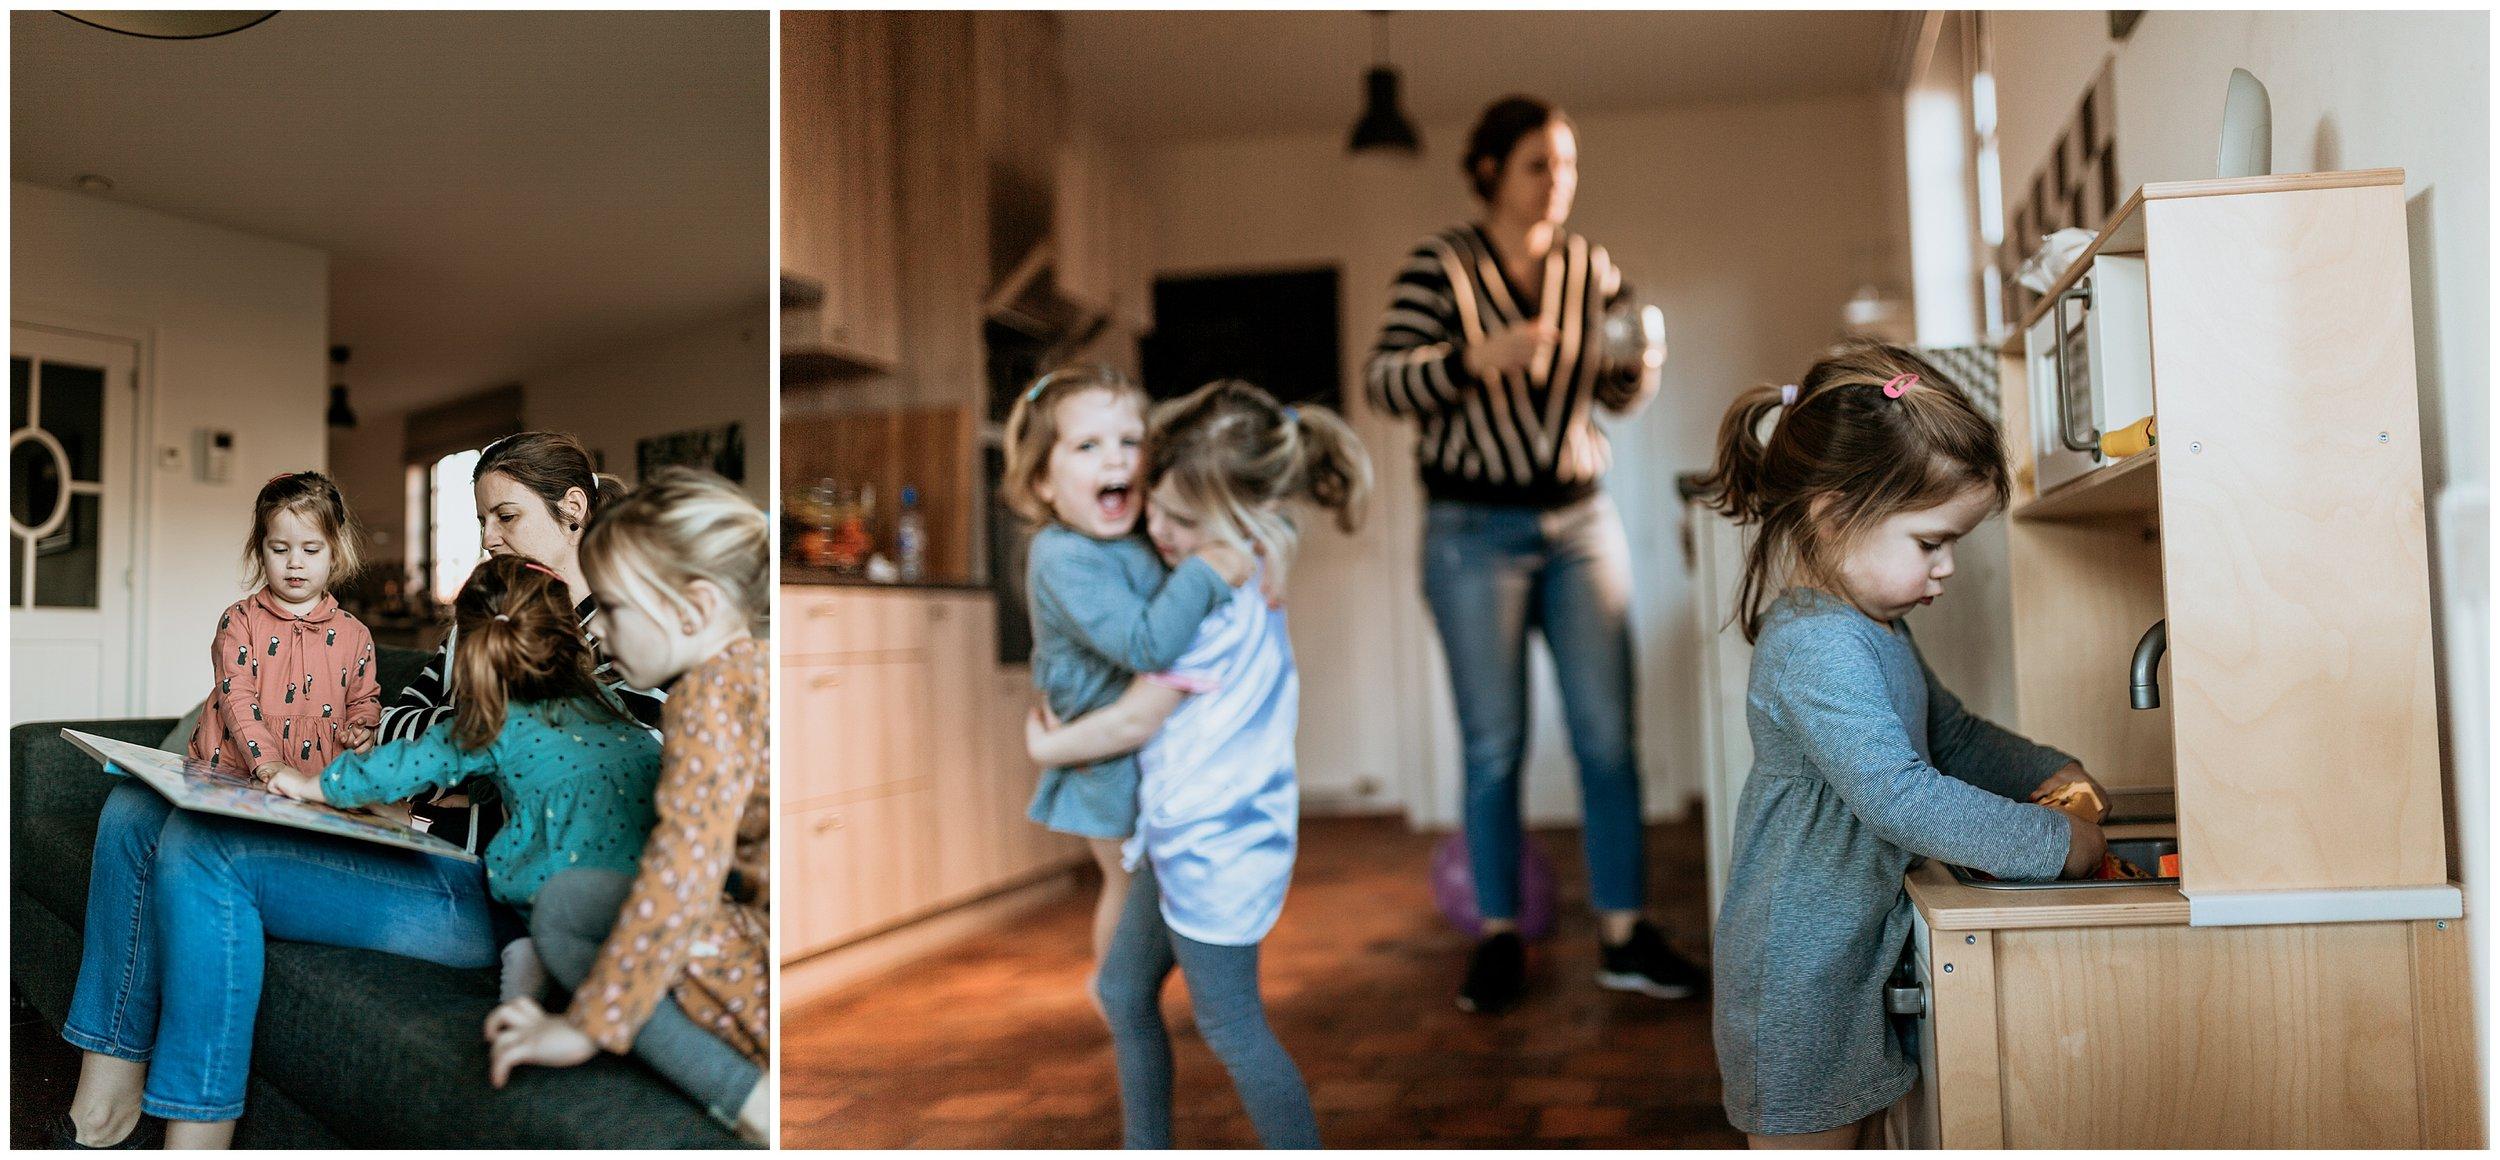 Day-in-the-life-lisa-helsen-herentals-vorselaar_0005.jpg